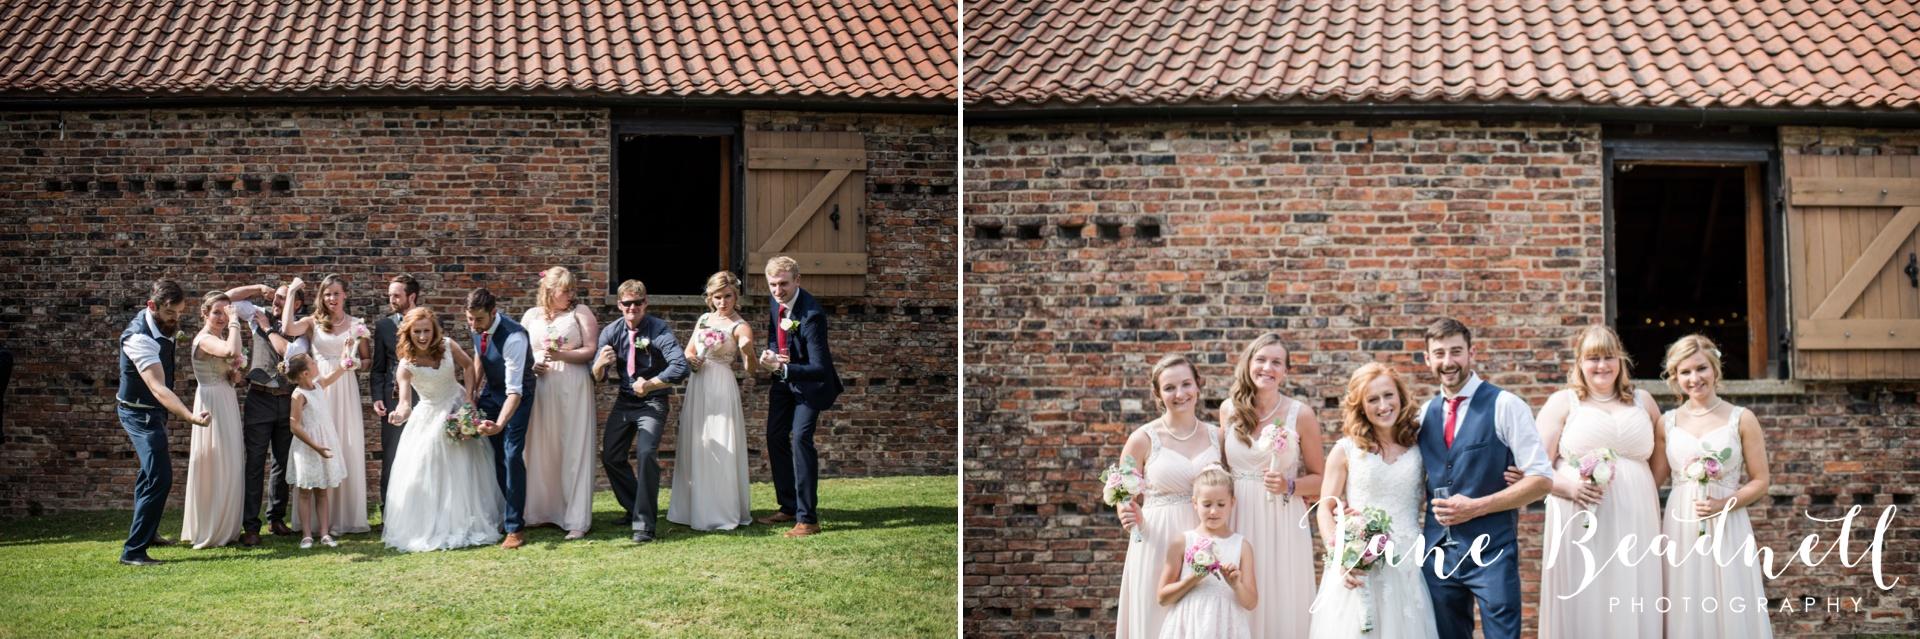 yorkshire-fine-art-wedding-photographer-jane-beadnell-photography-poppleton-york_0092